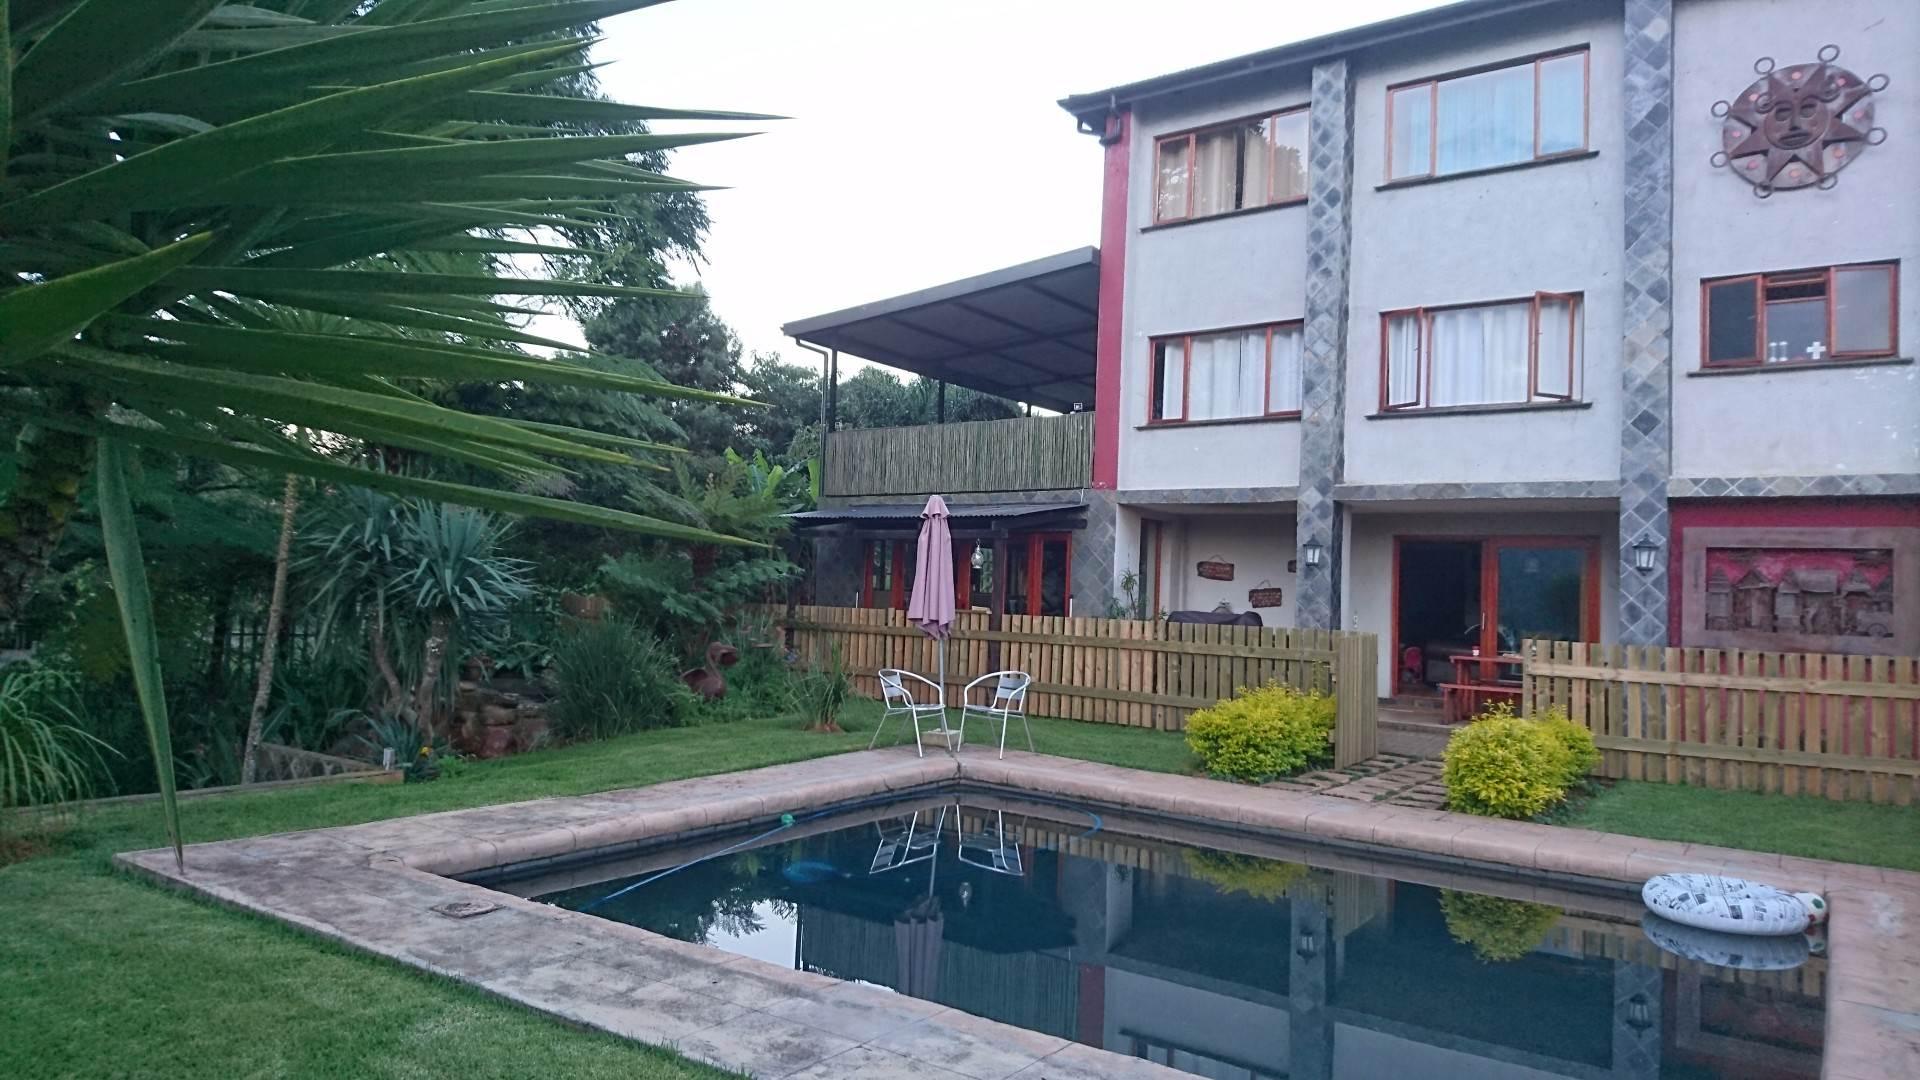 5 BedroomHouse For Sale In Graskop